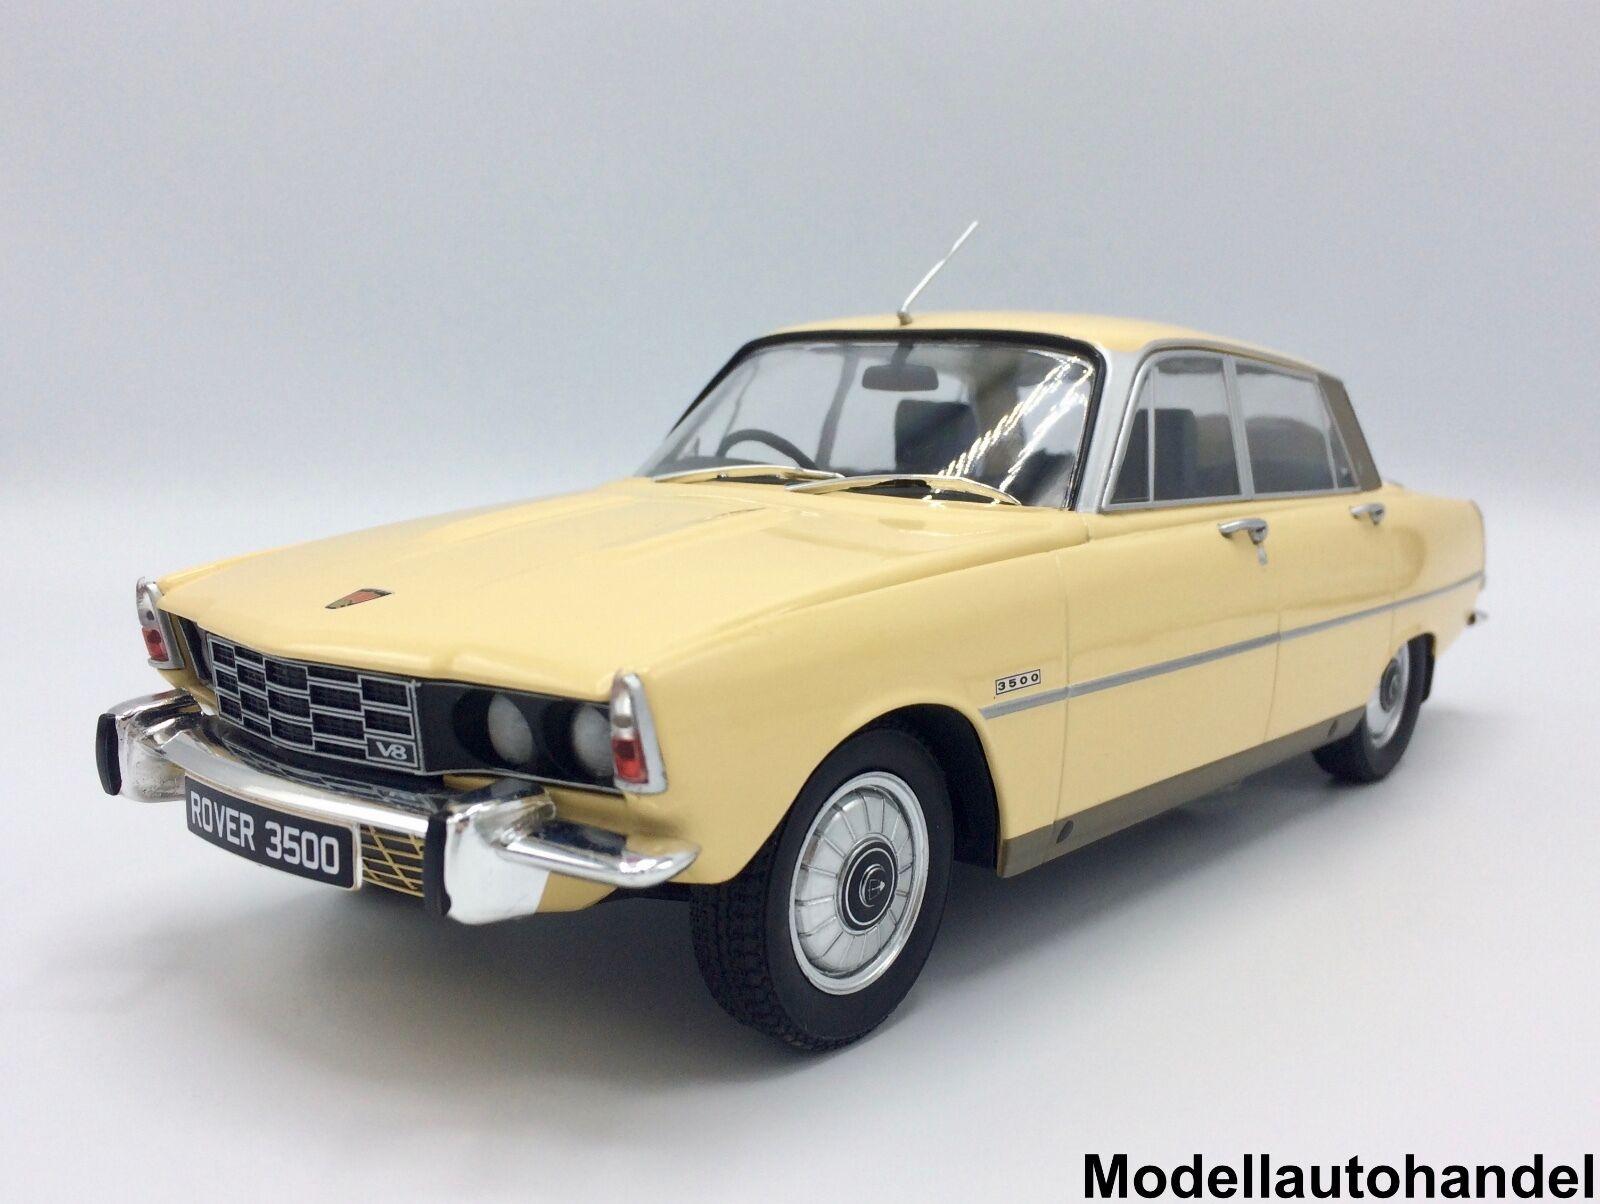 Rover 3500 V8 RHD 1974 oscuro amarillo 1 18 18 18 MCG   Nueva b22b89